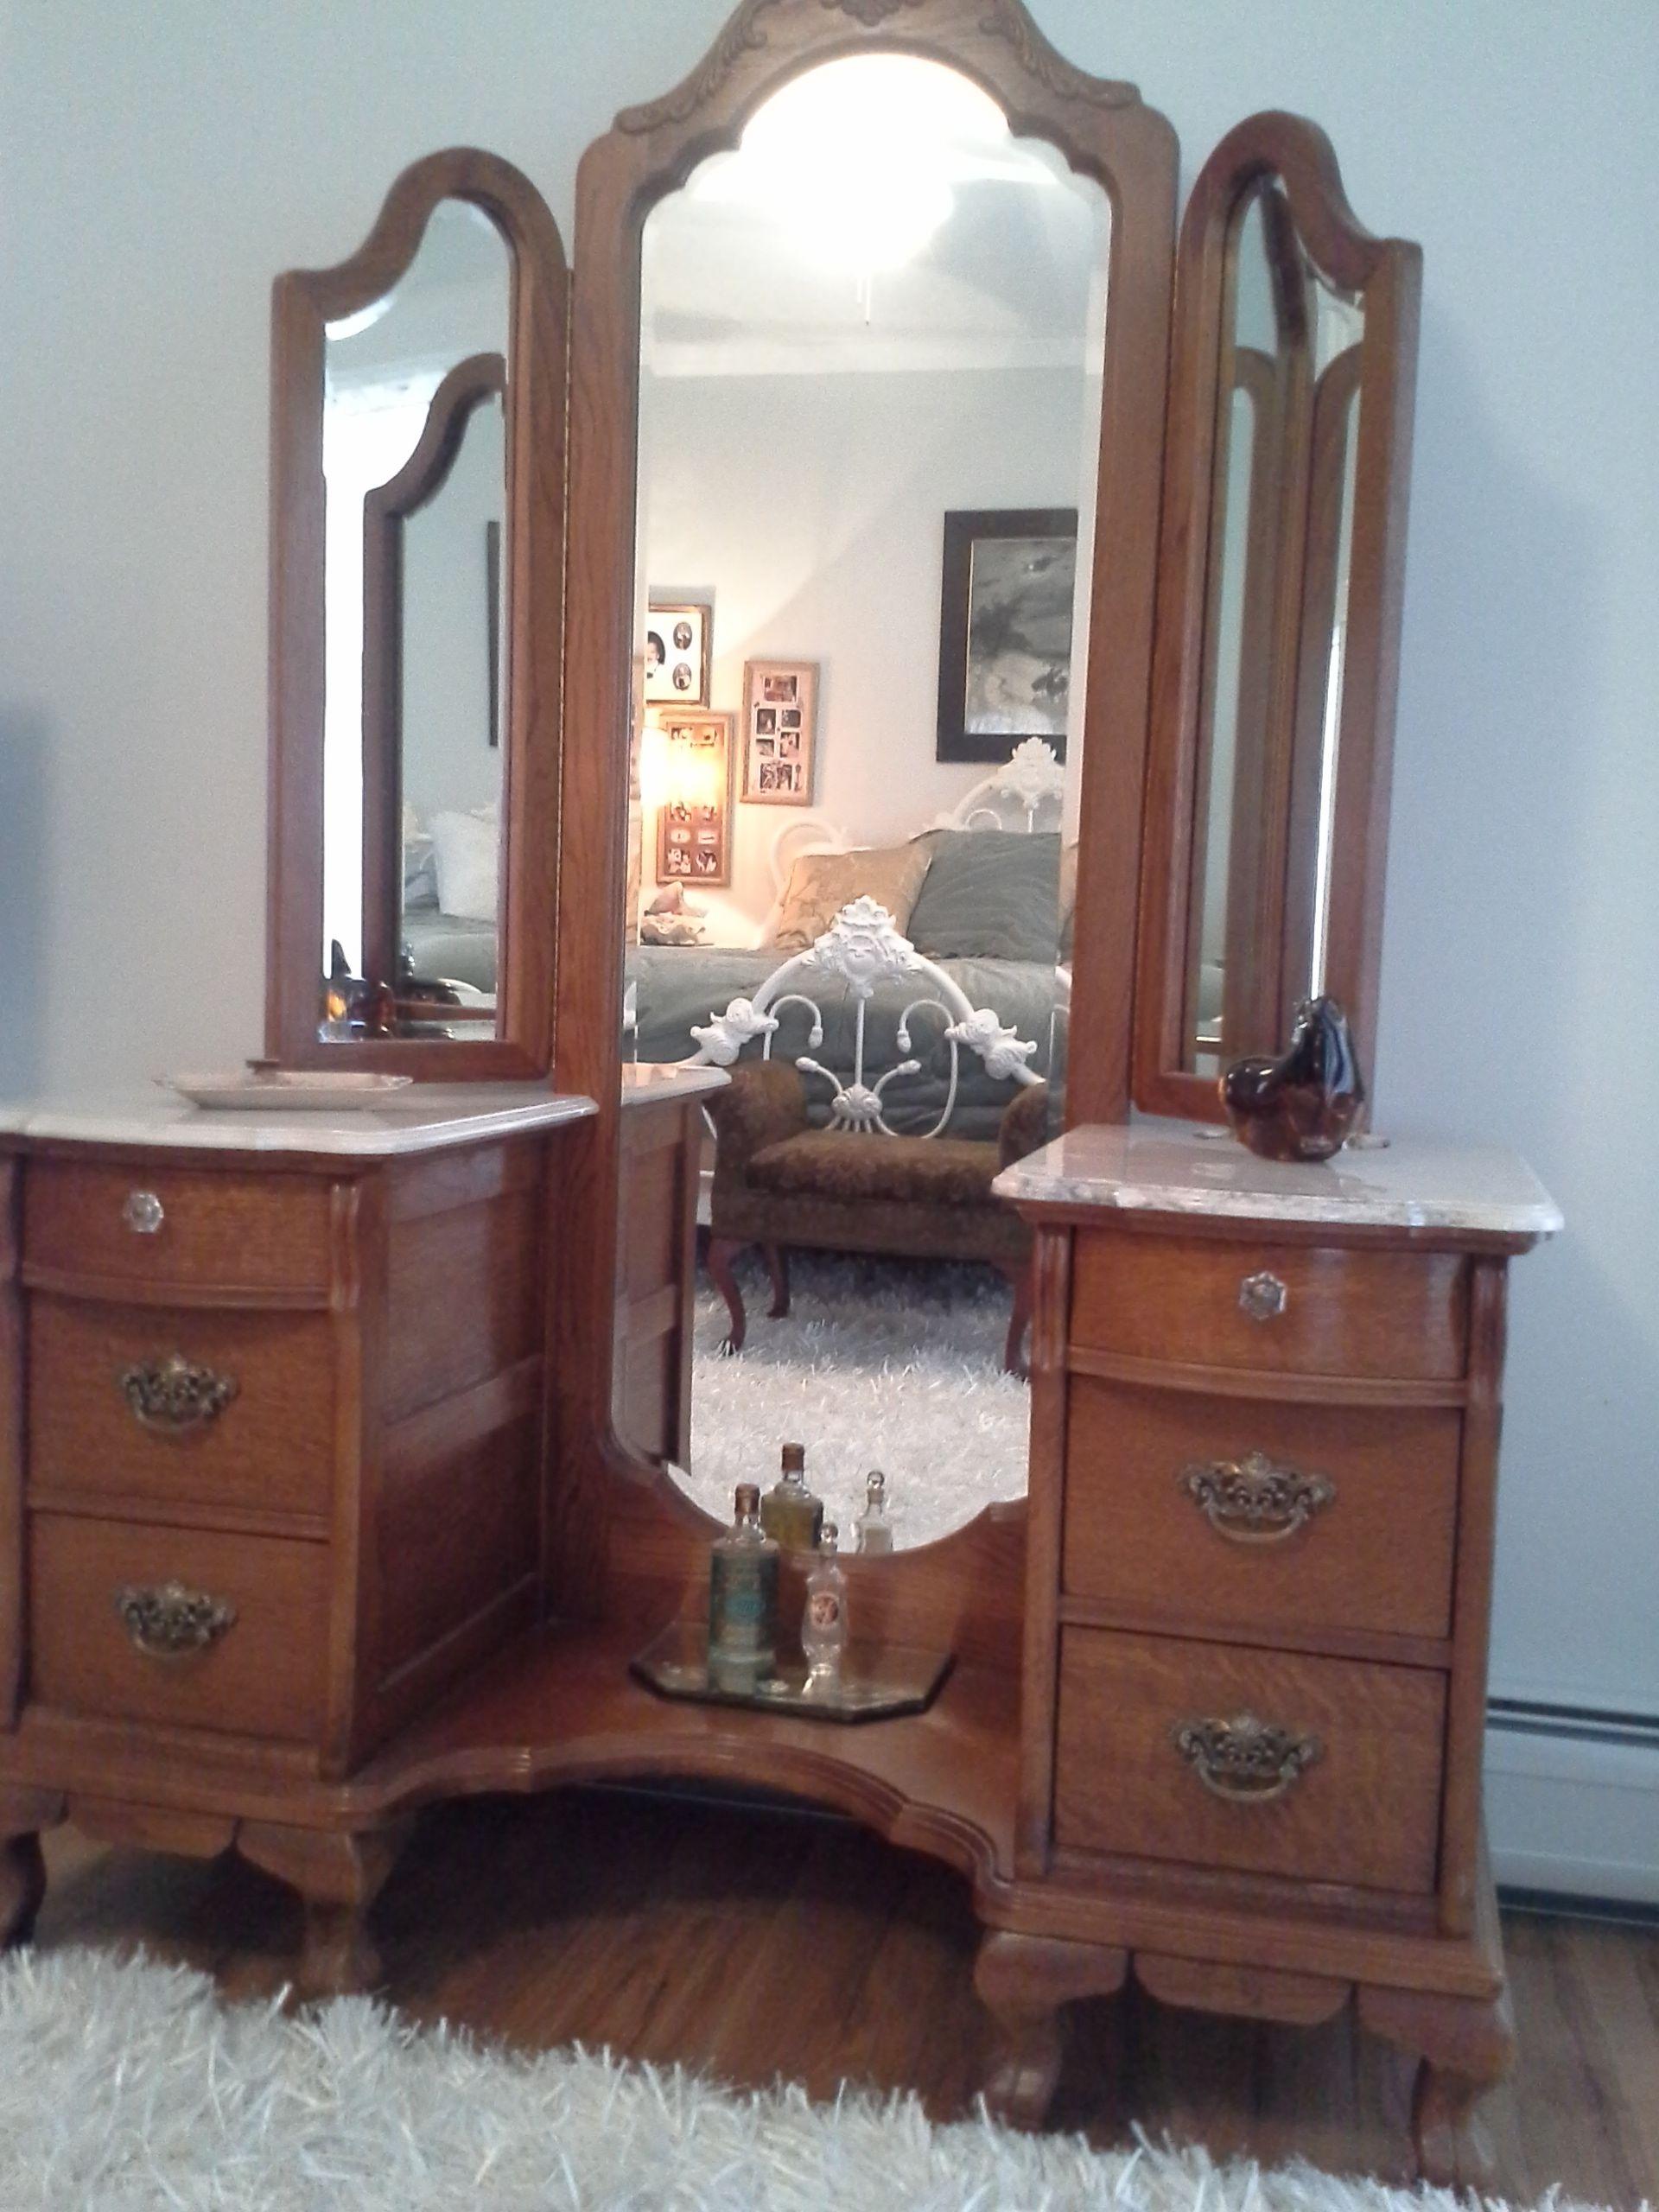 I Have A Queen Lexington Victorian Sampler Bed For Sale In Metro St Louis Area 650 Obo Lexington Furniture Bedroom Furniture Oak Bedroom